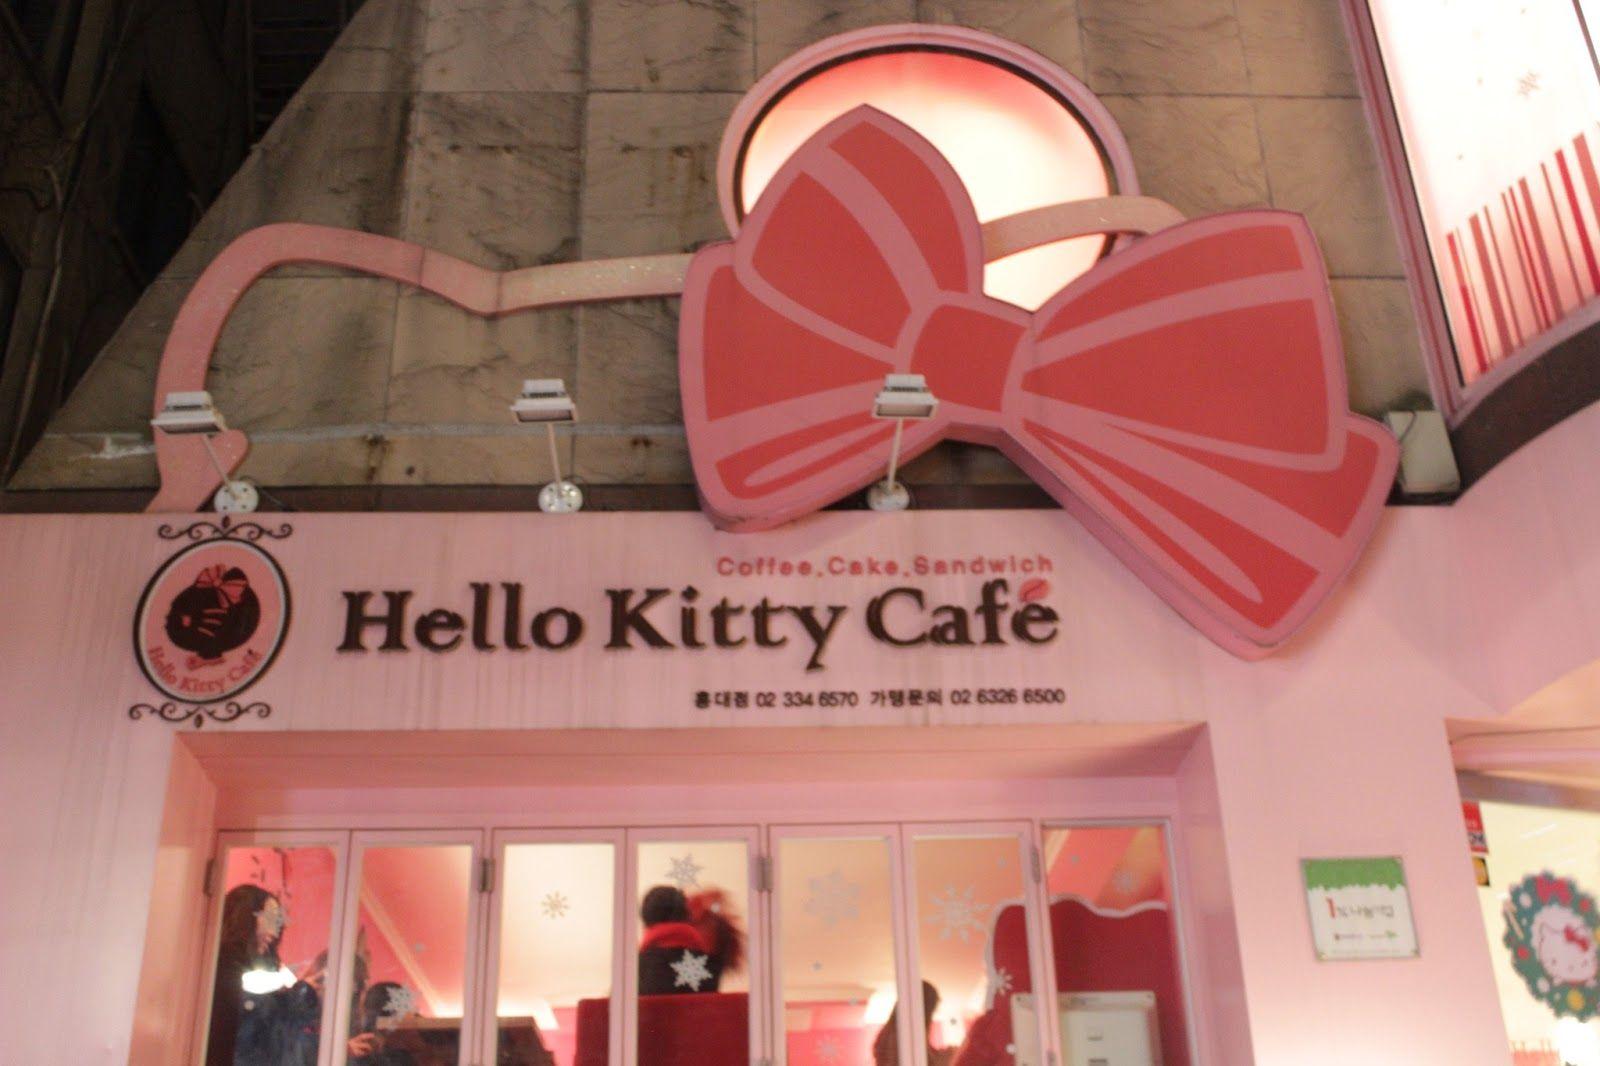 House design hello kitty - Hello Kitty Cafe Design